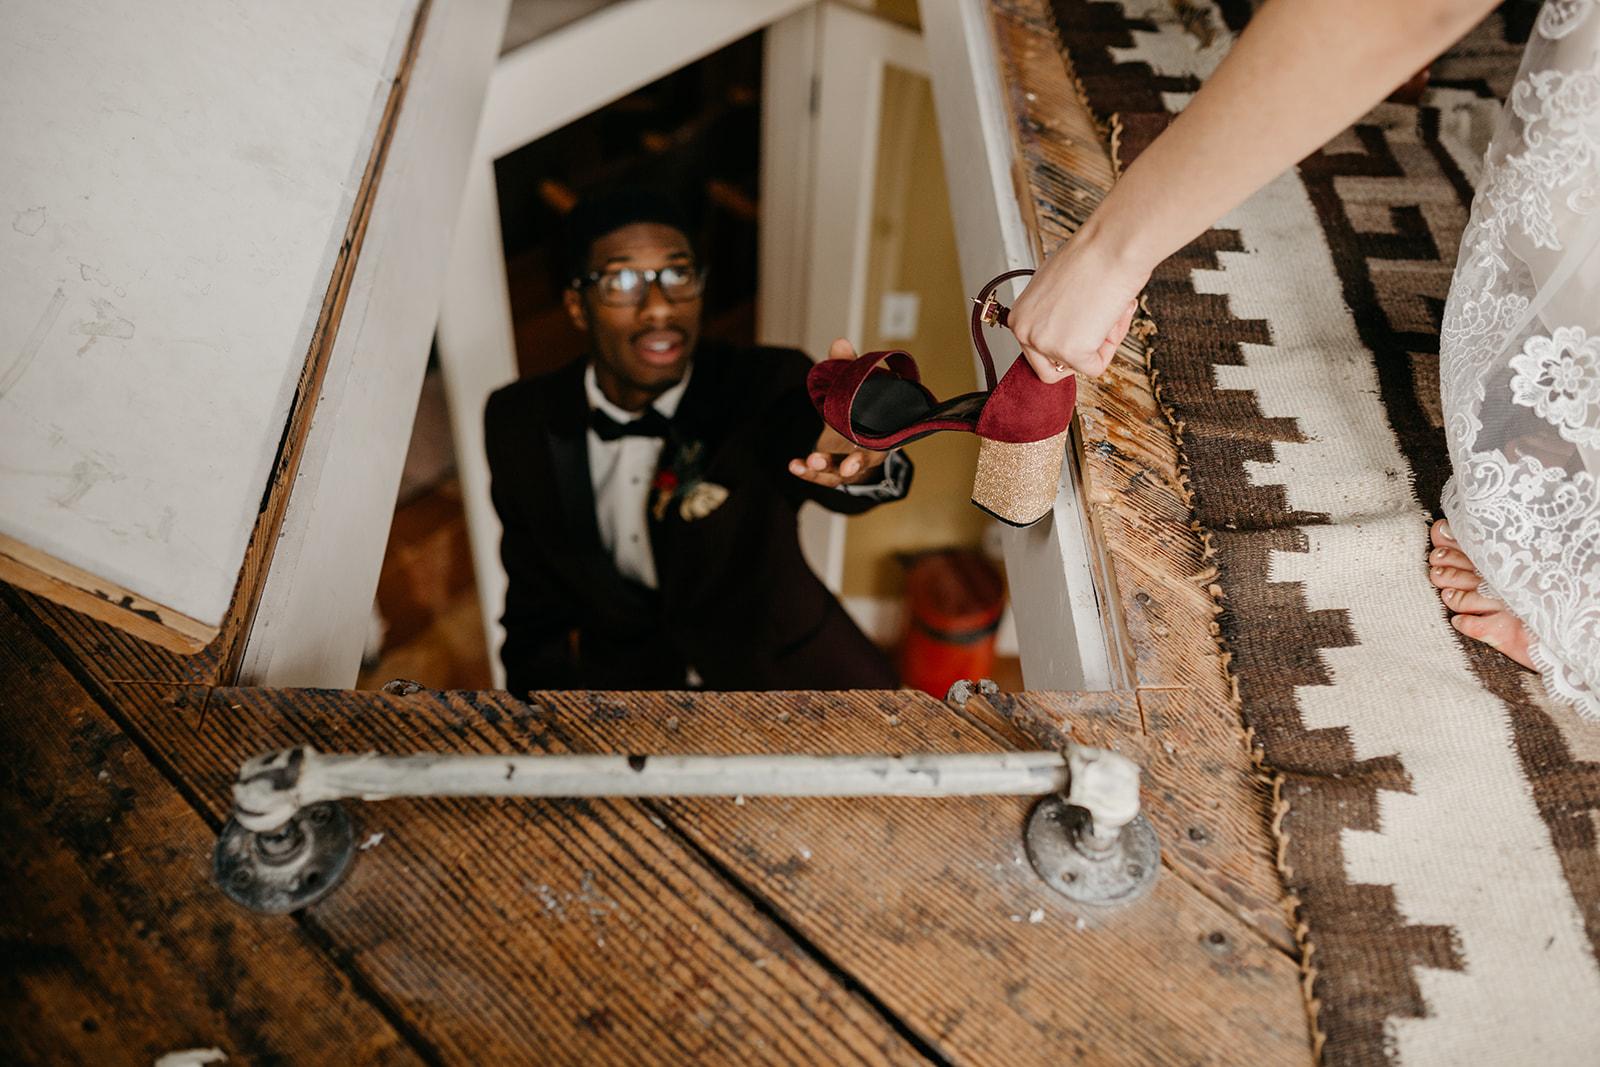 portland - wedding - photographer - doorofhopechurch244.jpg